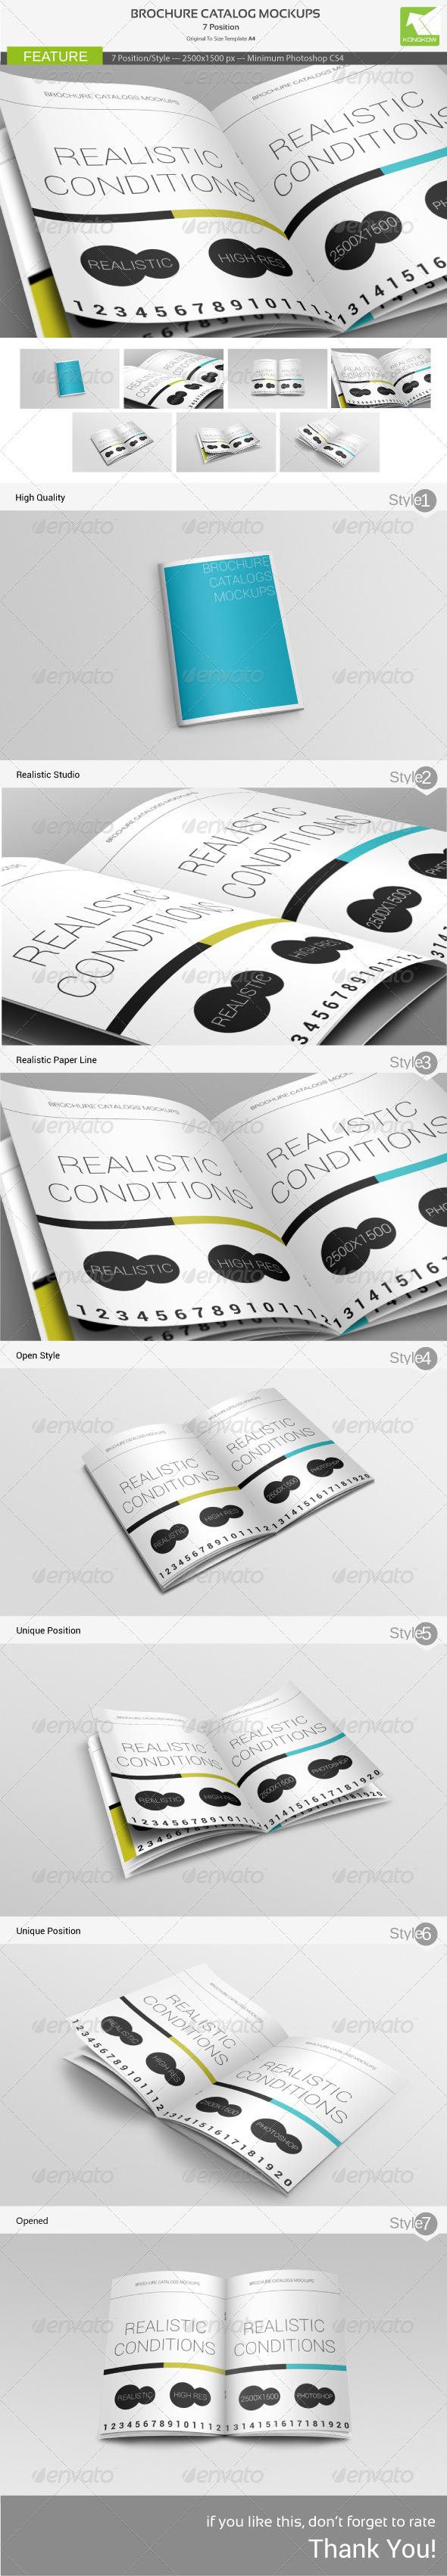 Brochure Catalog Mockups - Brochures Print